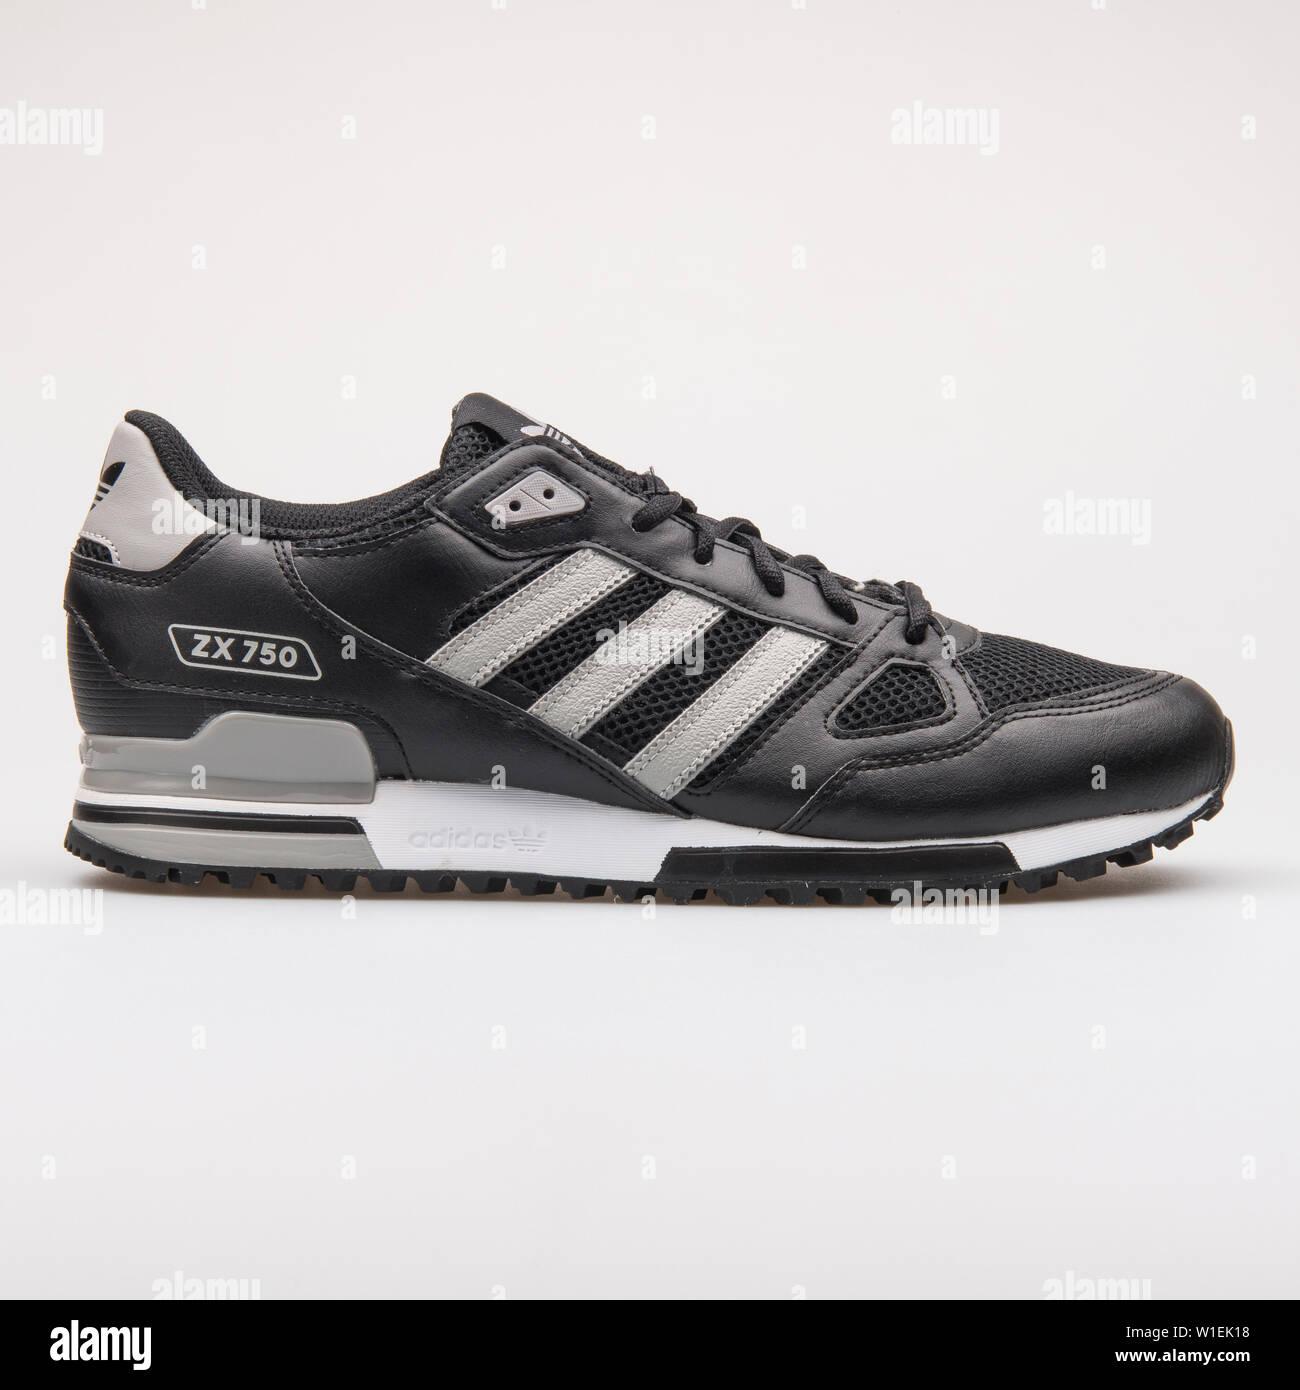 quality design 4d671 0594a VIENNA, AUSTRIA - AUGUST 28, 2017: Adidas ZX 750 black and ...